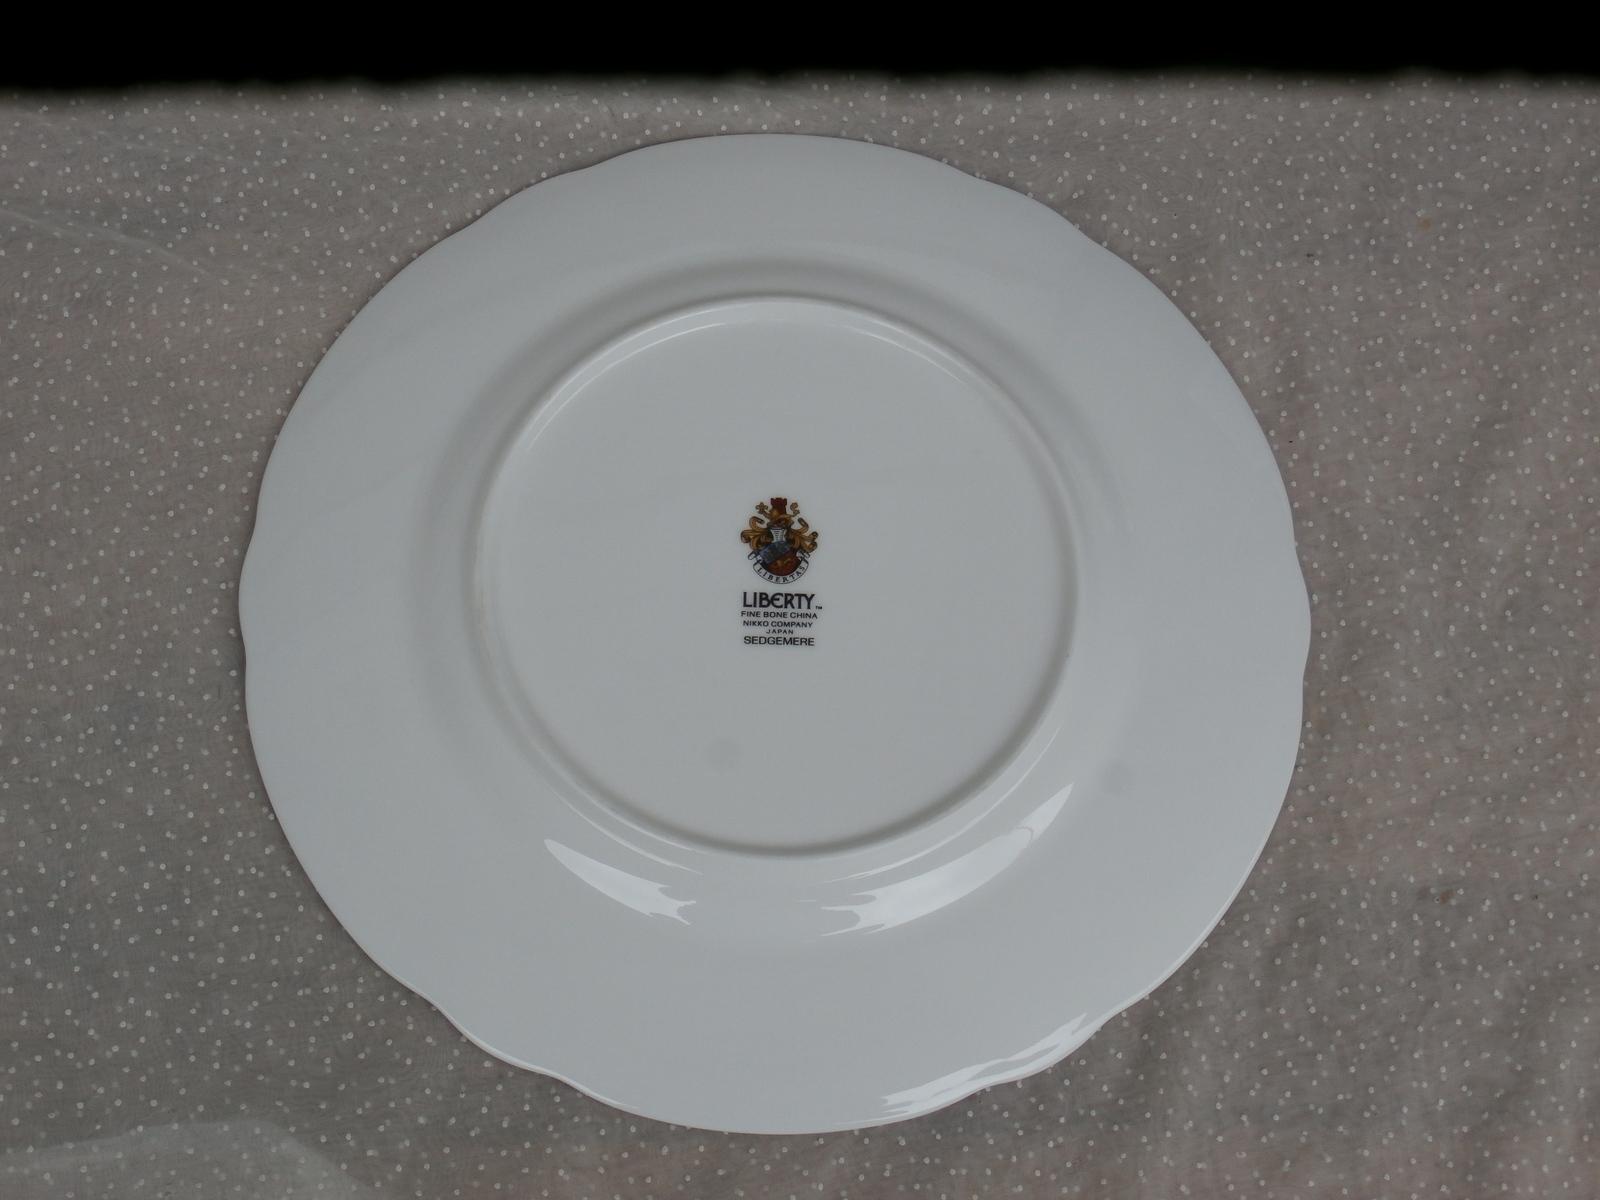 Nikko Sedgemere Dinner Plate Liberty Fine Bone China, Blue Rim with Flowers